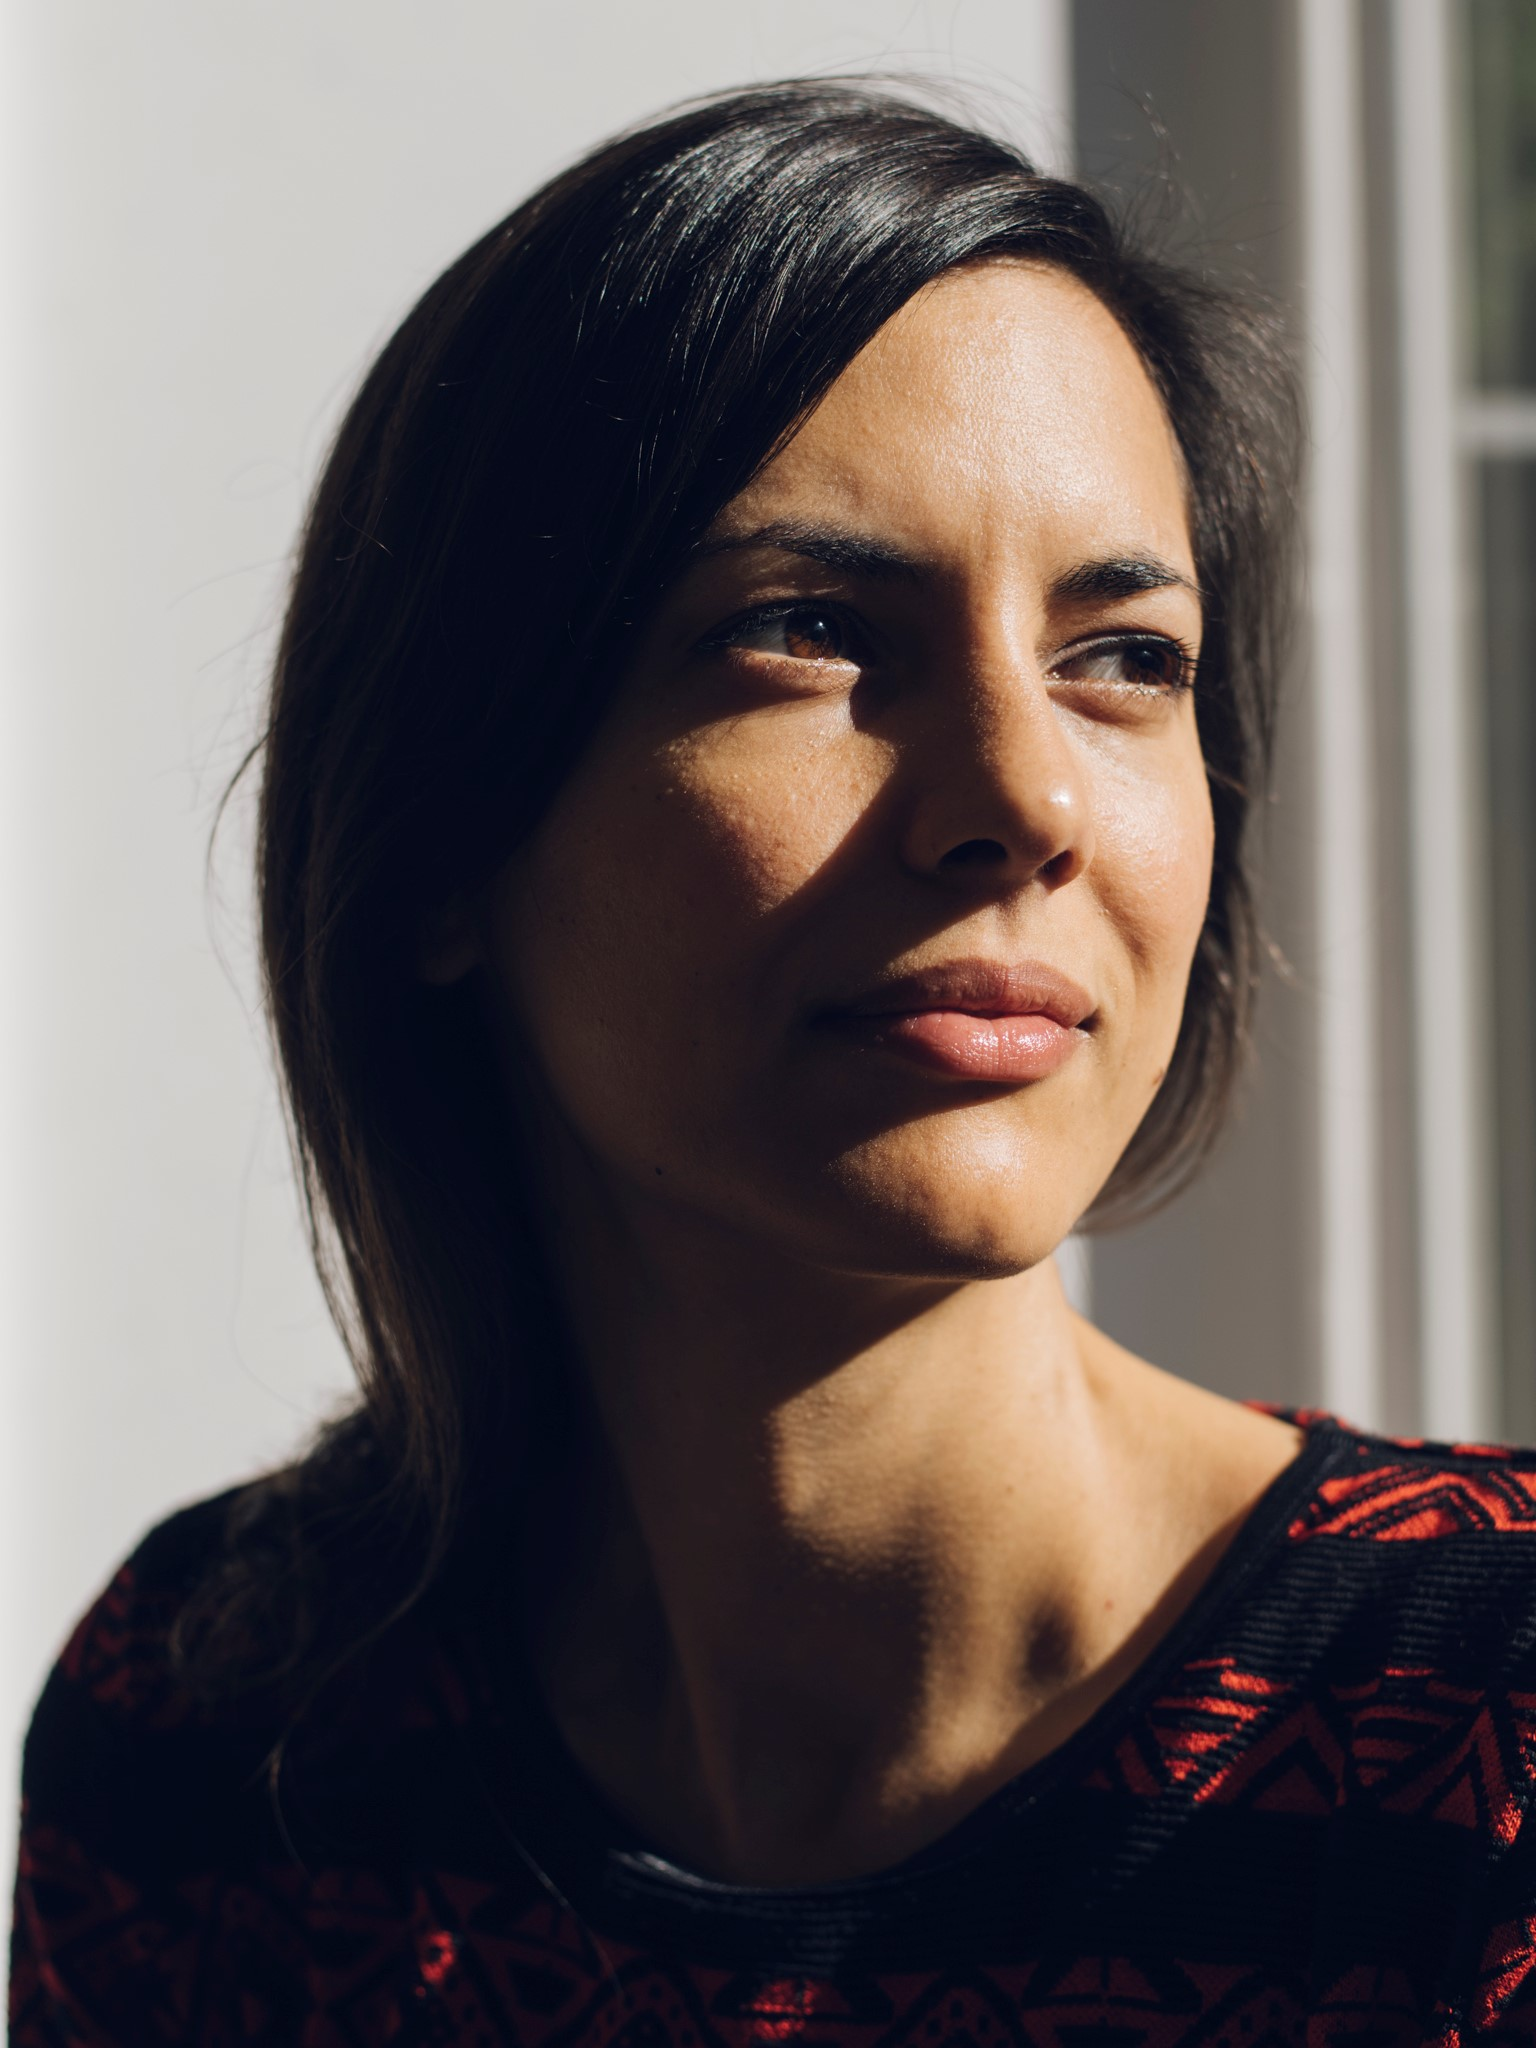 Sonja Jost